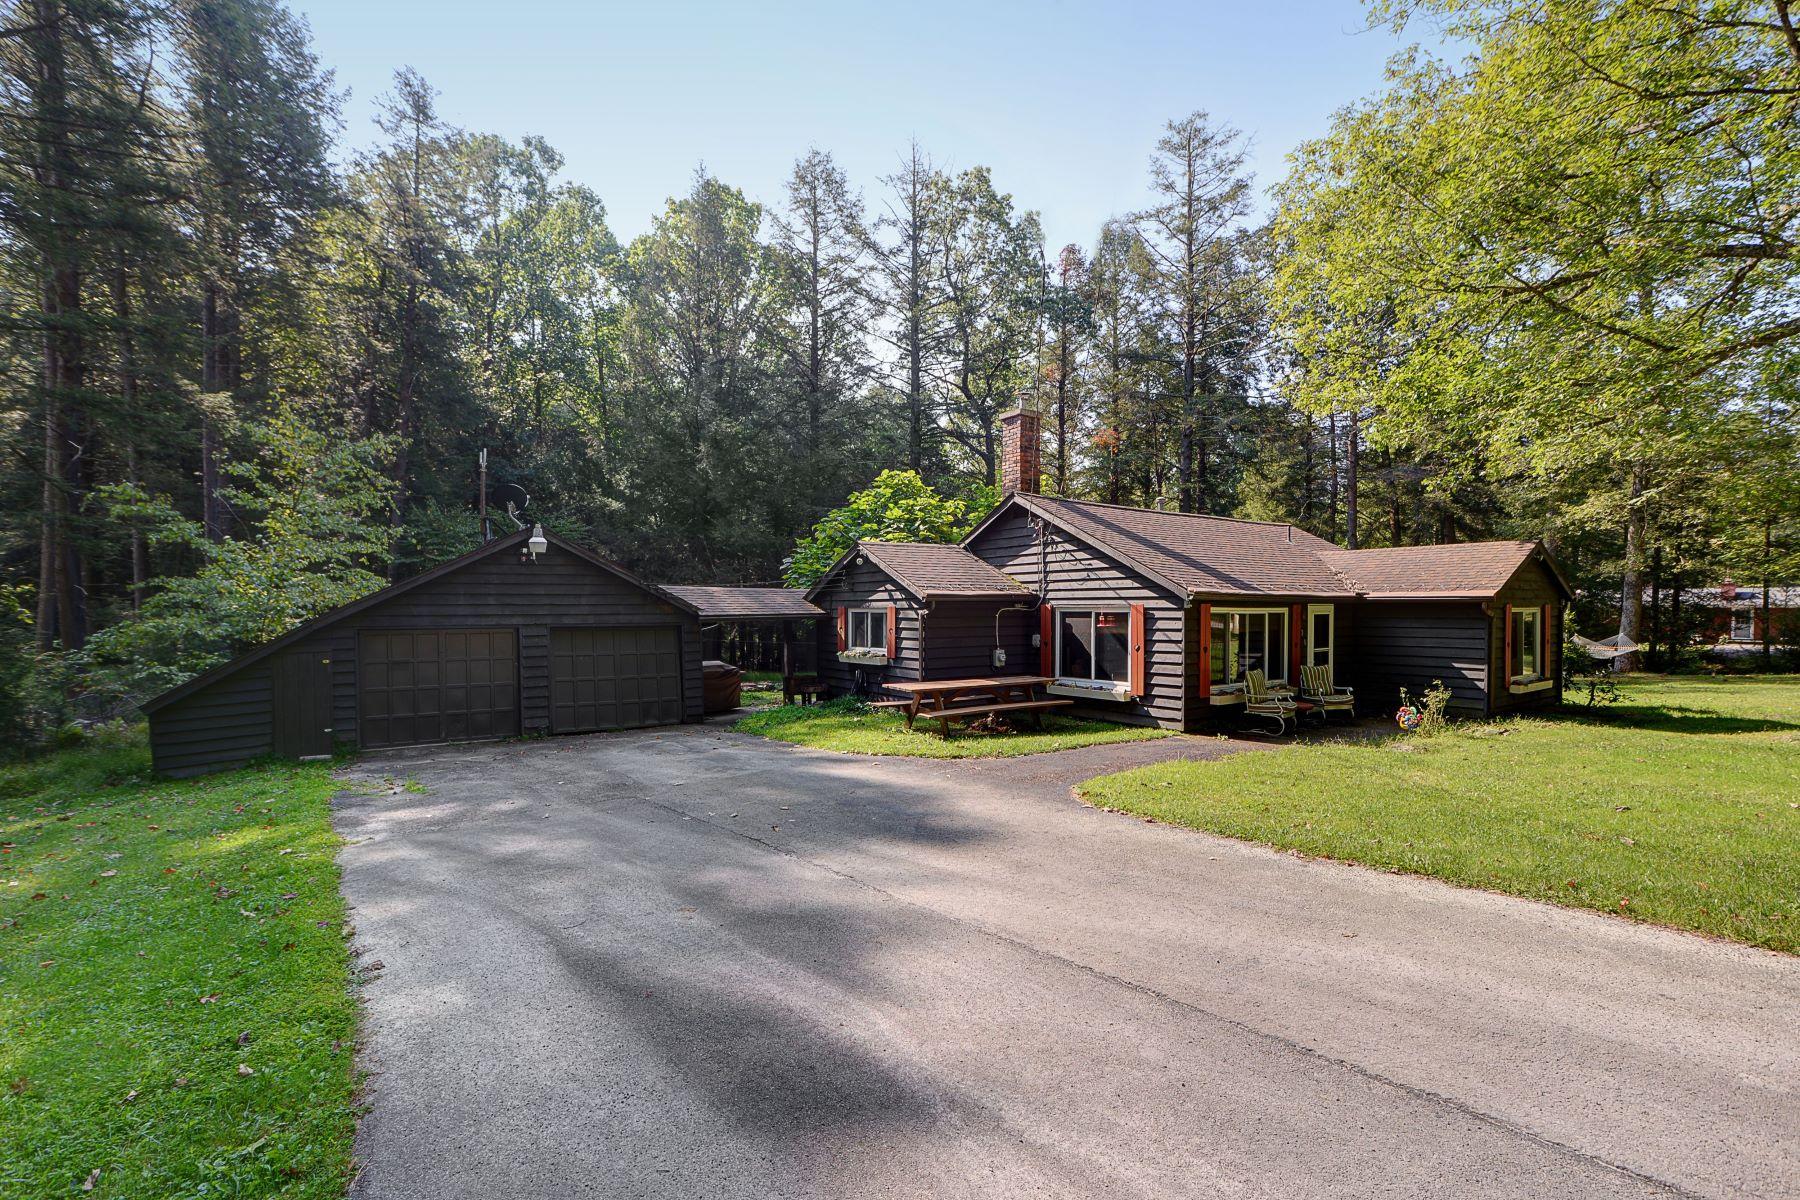 Single Family Homes for Sale at 220 DW Lane Ligonier Township, Pennsylvania 15656 United States